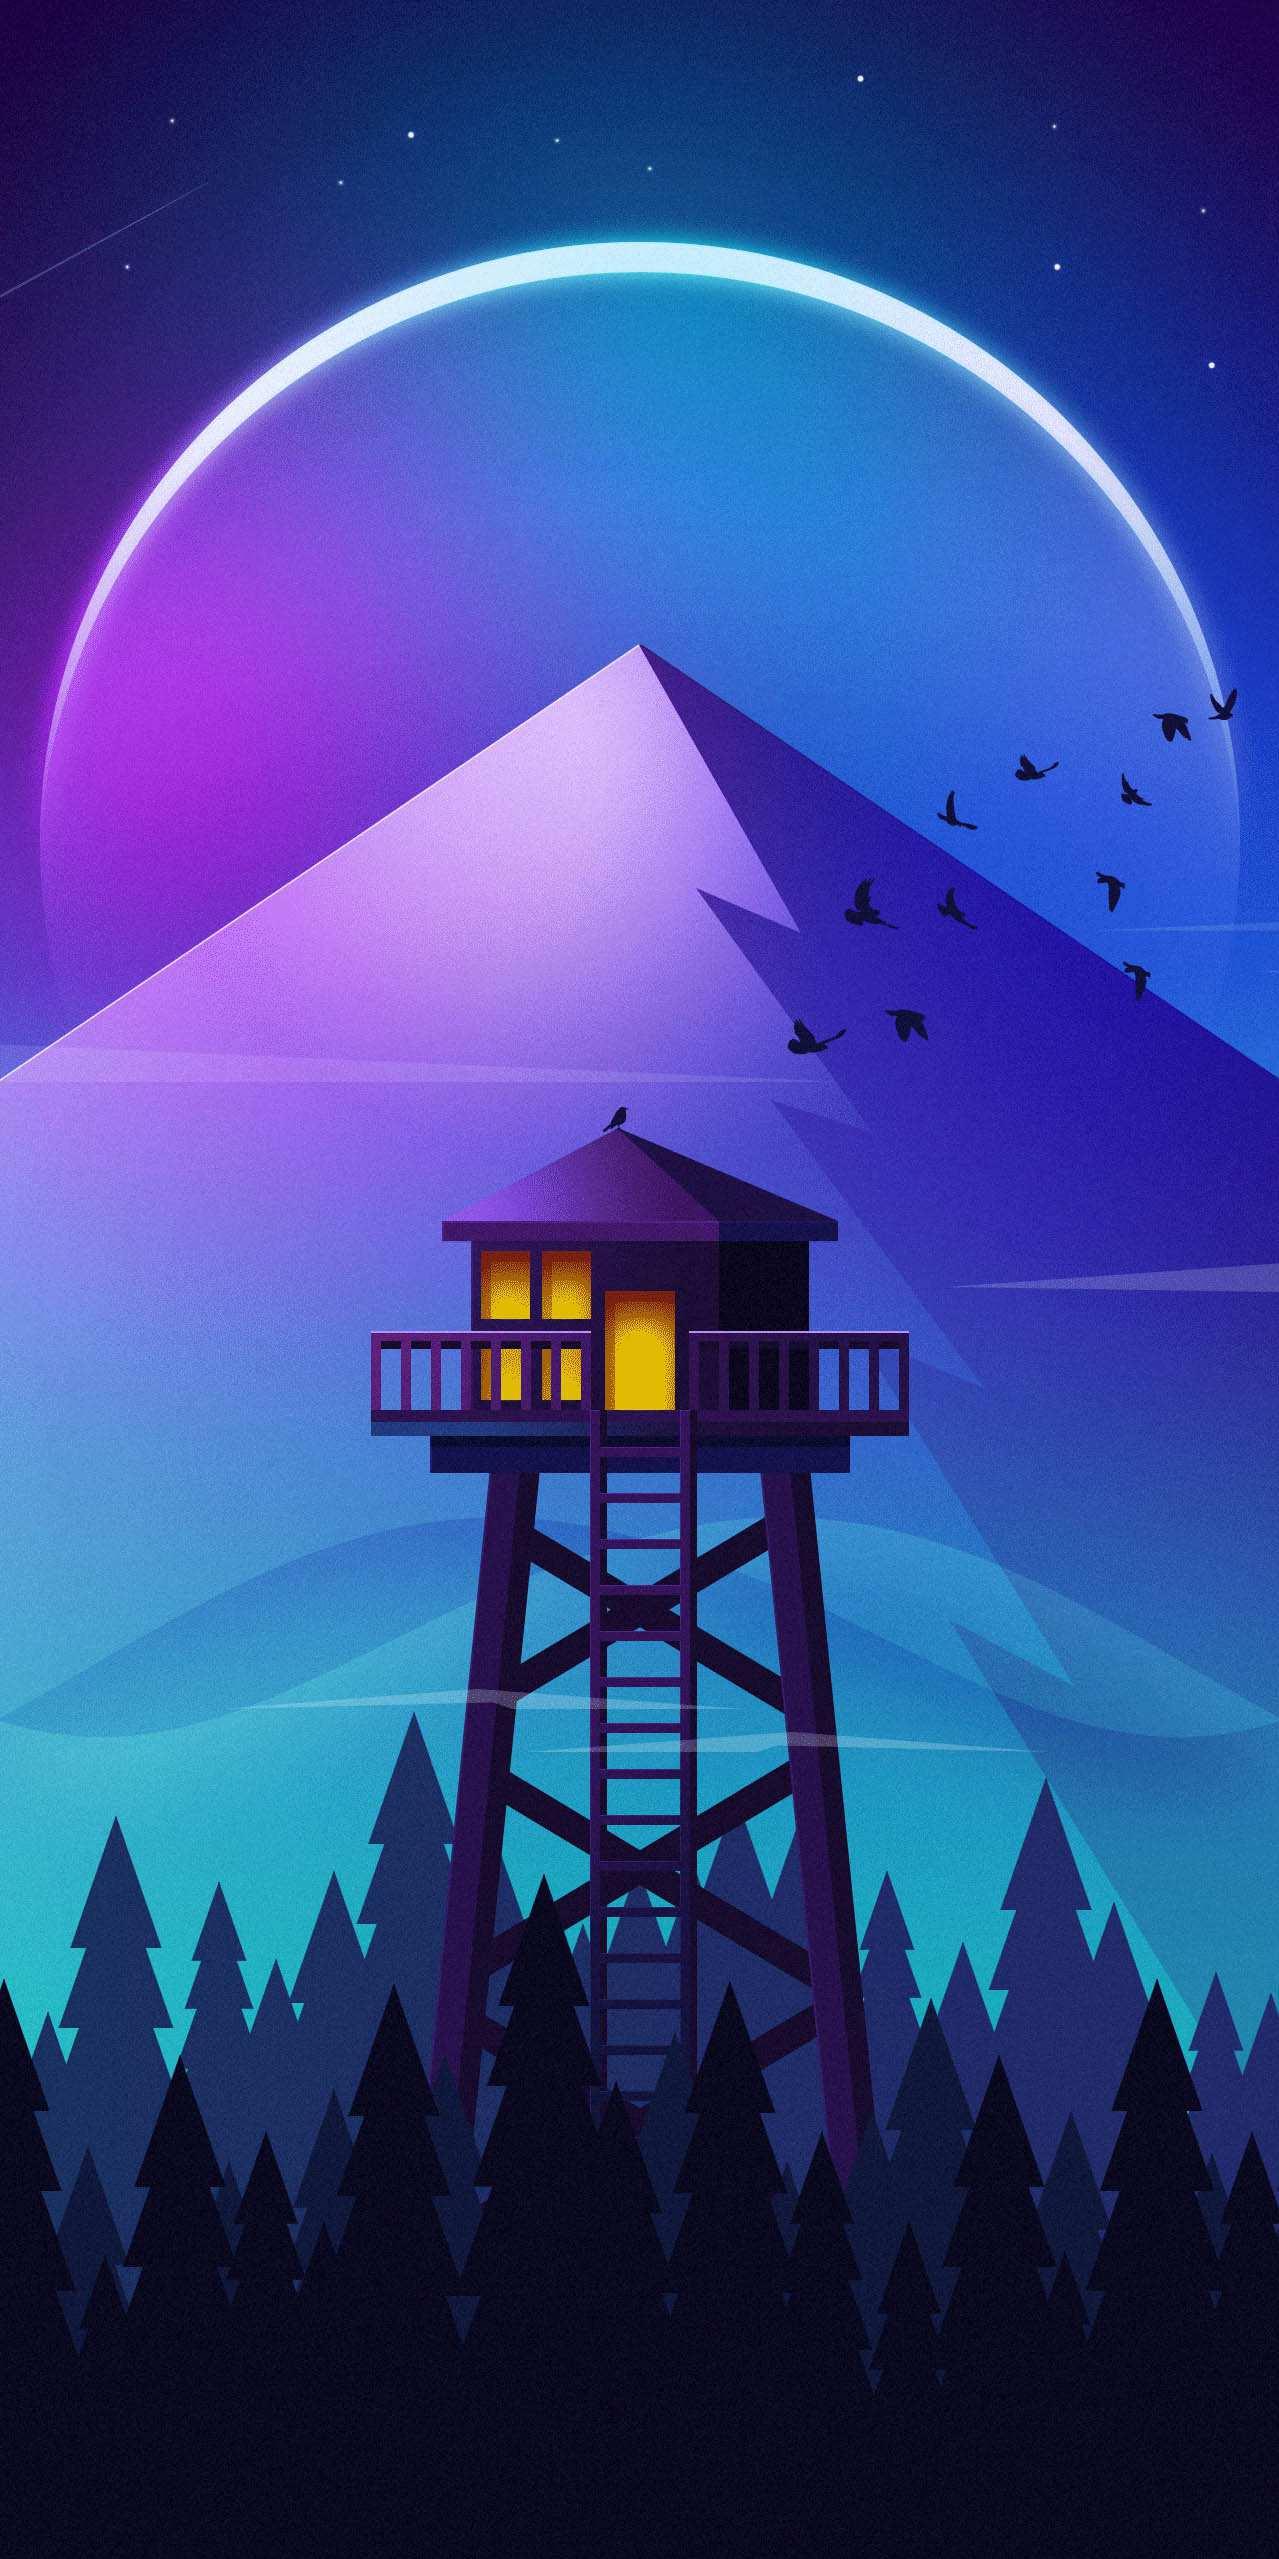 Purple Iphone Wallpaper Minimal Watch Tower Forest Iphone Wallpaper Iphone